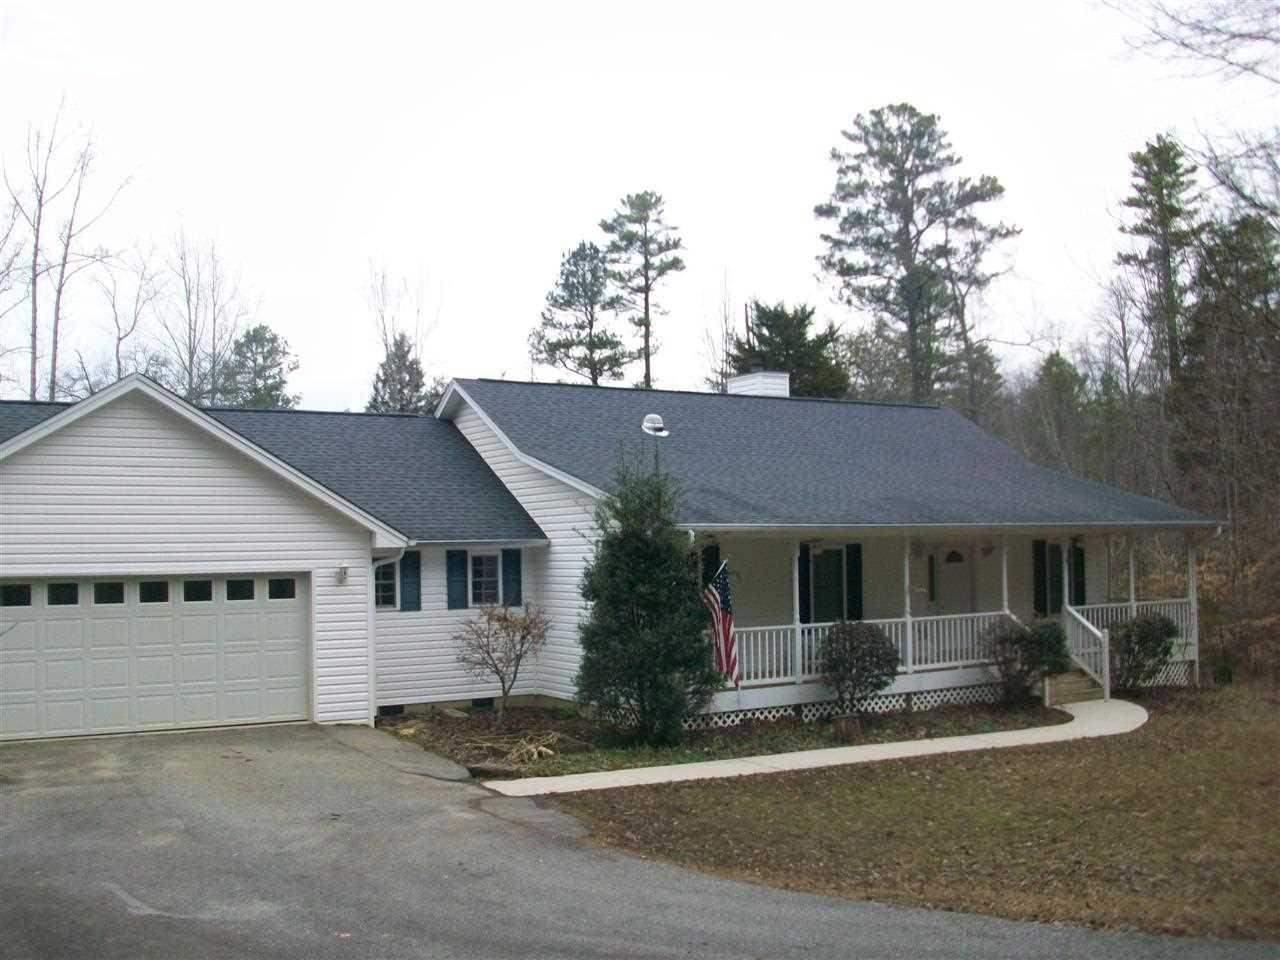 Rental Homes for Rent, ListingId:31123073, location: 148 Carrousel Dr. Central 29630